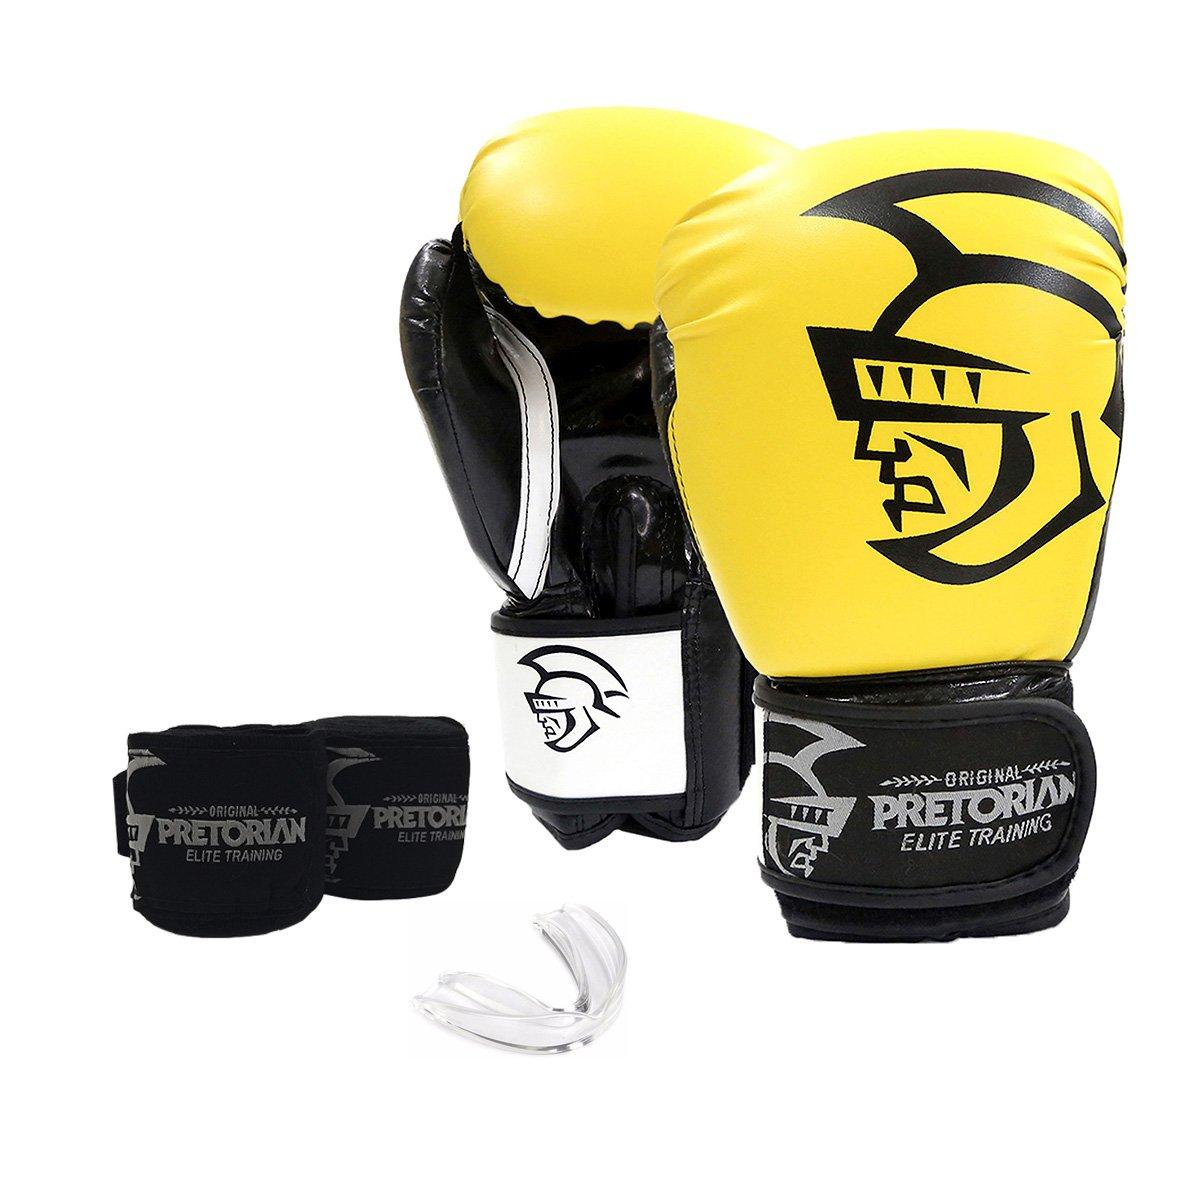 Kit Luva de Boxe/Muay Thai Pretorian Elite 16 Oz + Bandagem Elástica + Protetor Bucal